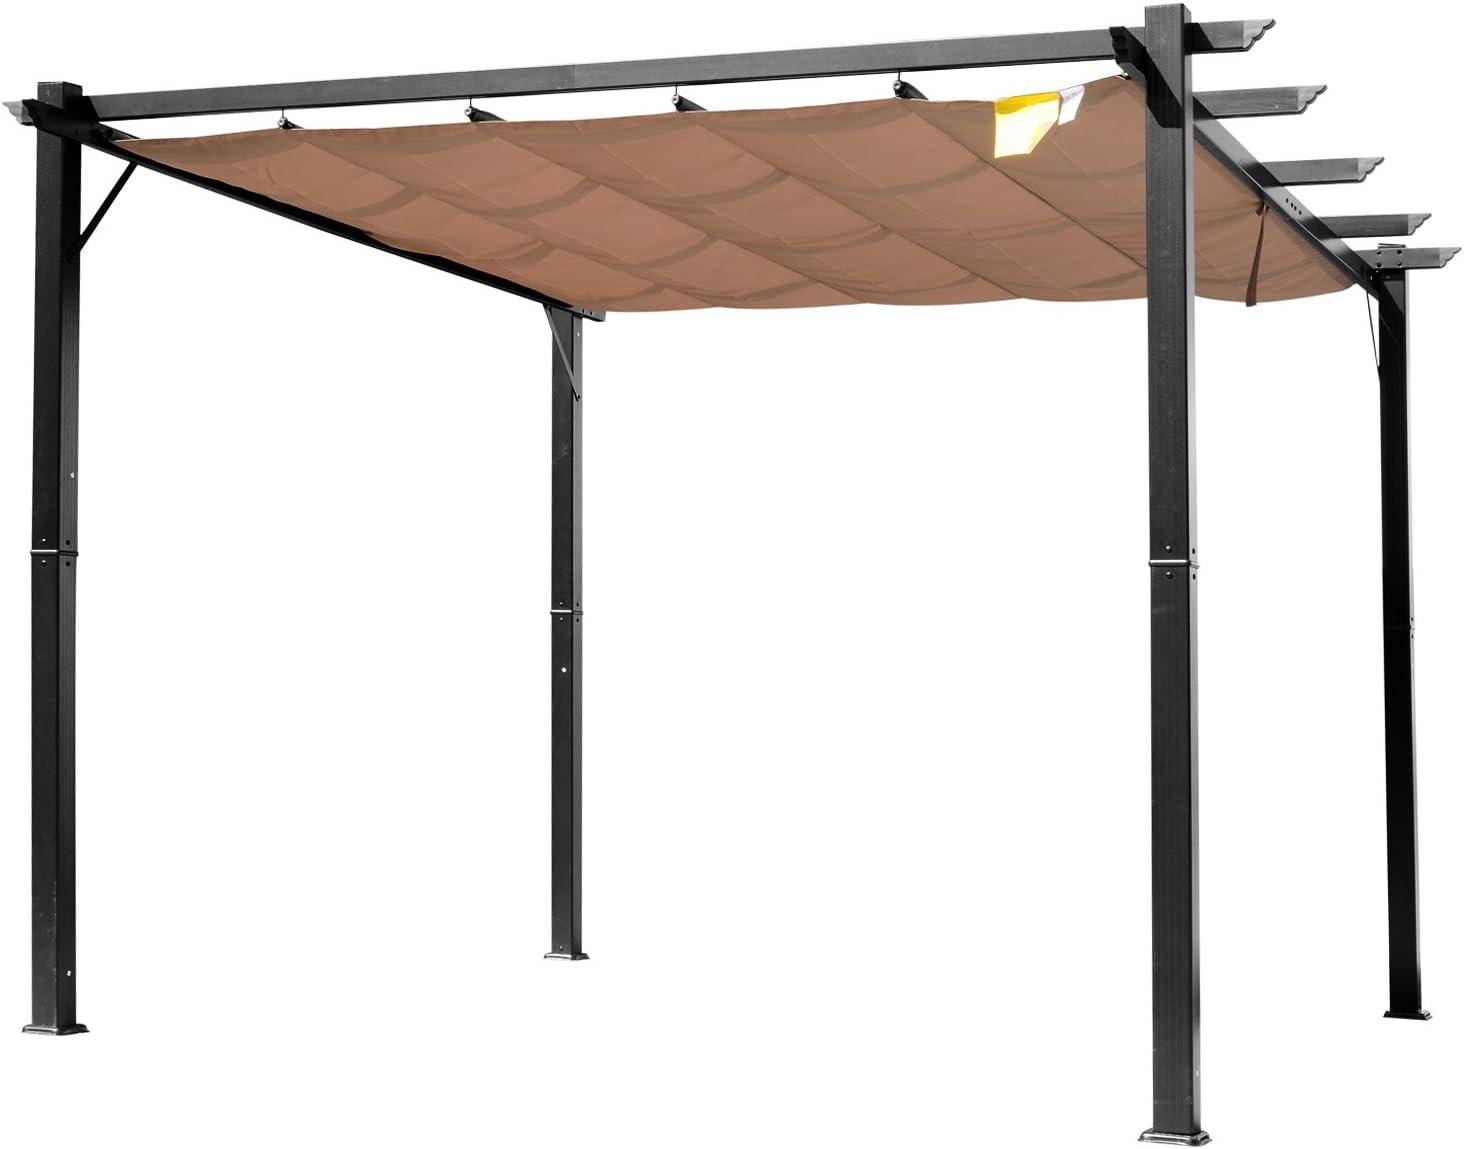 Outsunny - Pérgola de jardín de 3 x 4 m, lona deslizante de poliéster impermeable y estructura de aluminio: Amazon.es: Jardín